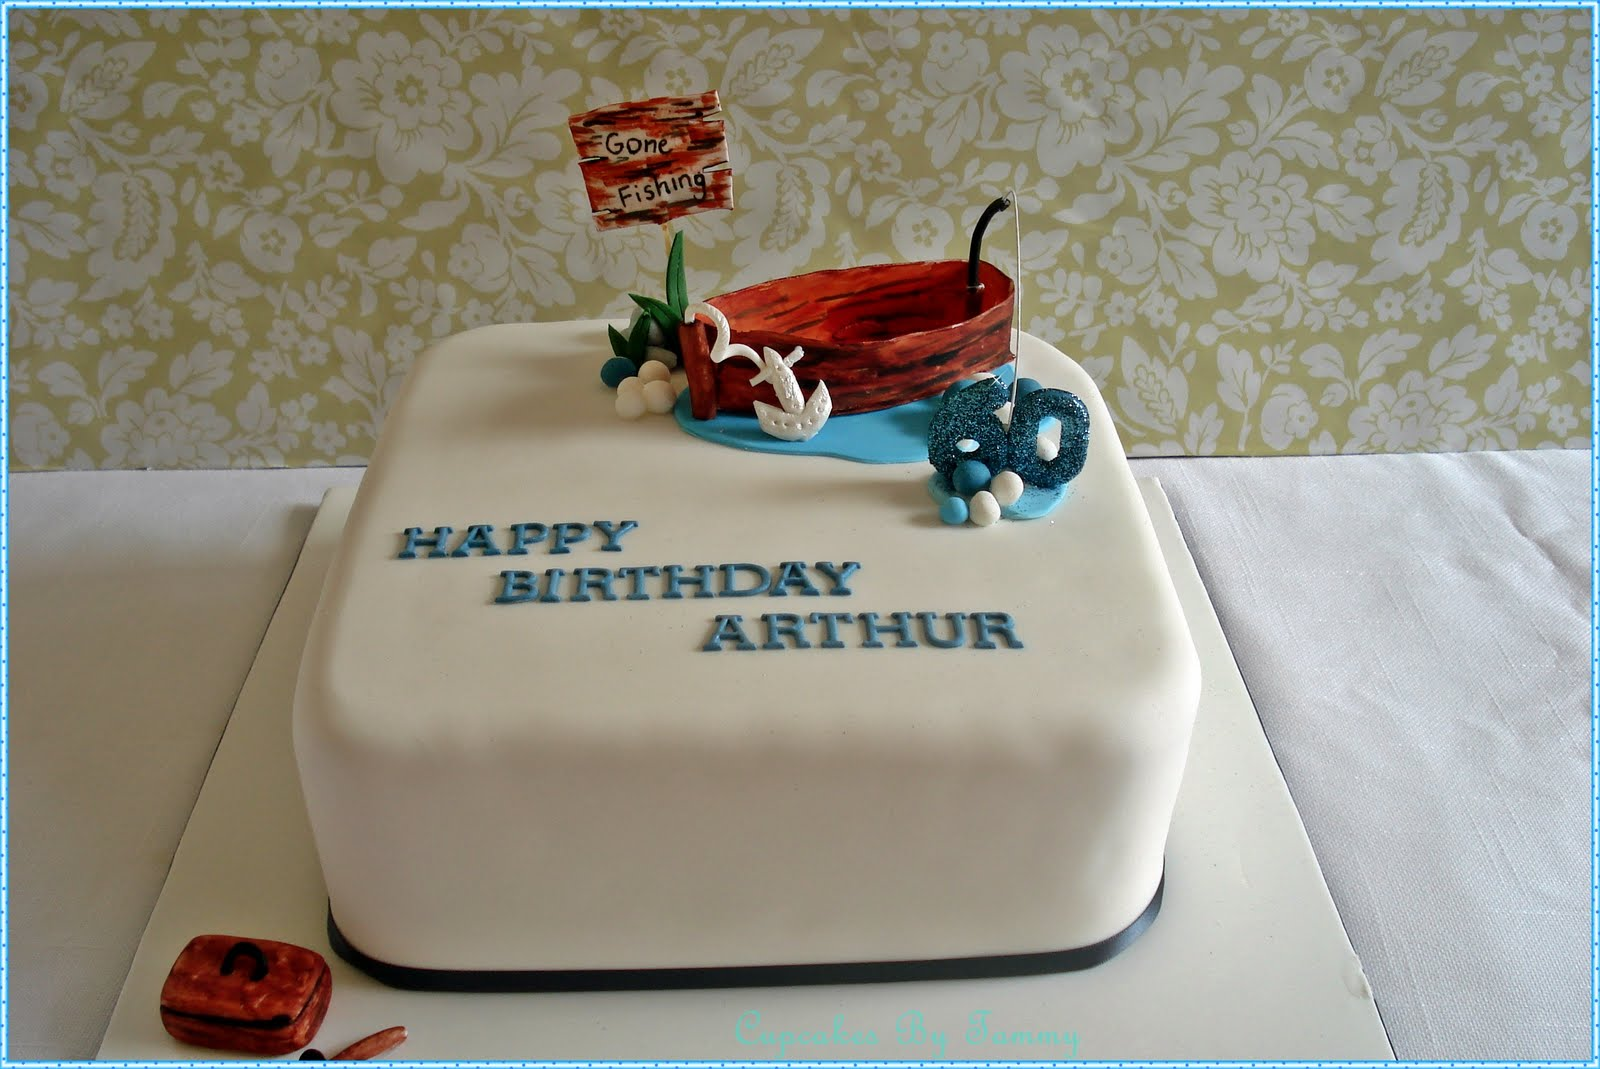 Birthday Cake King Arthur Image Inspiration of Cake and Birthday